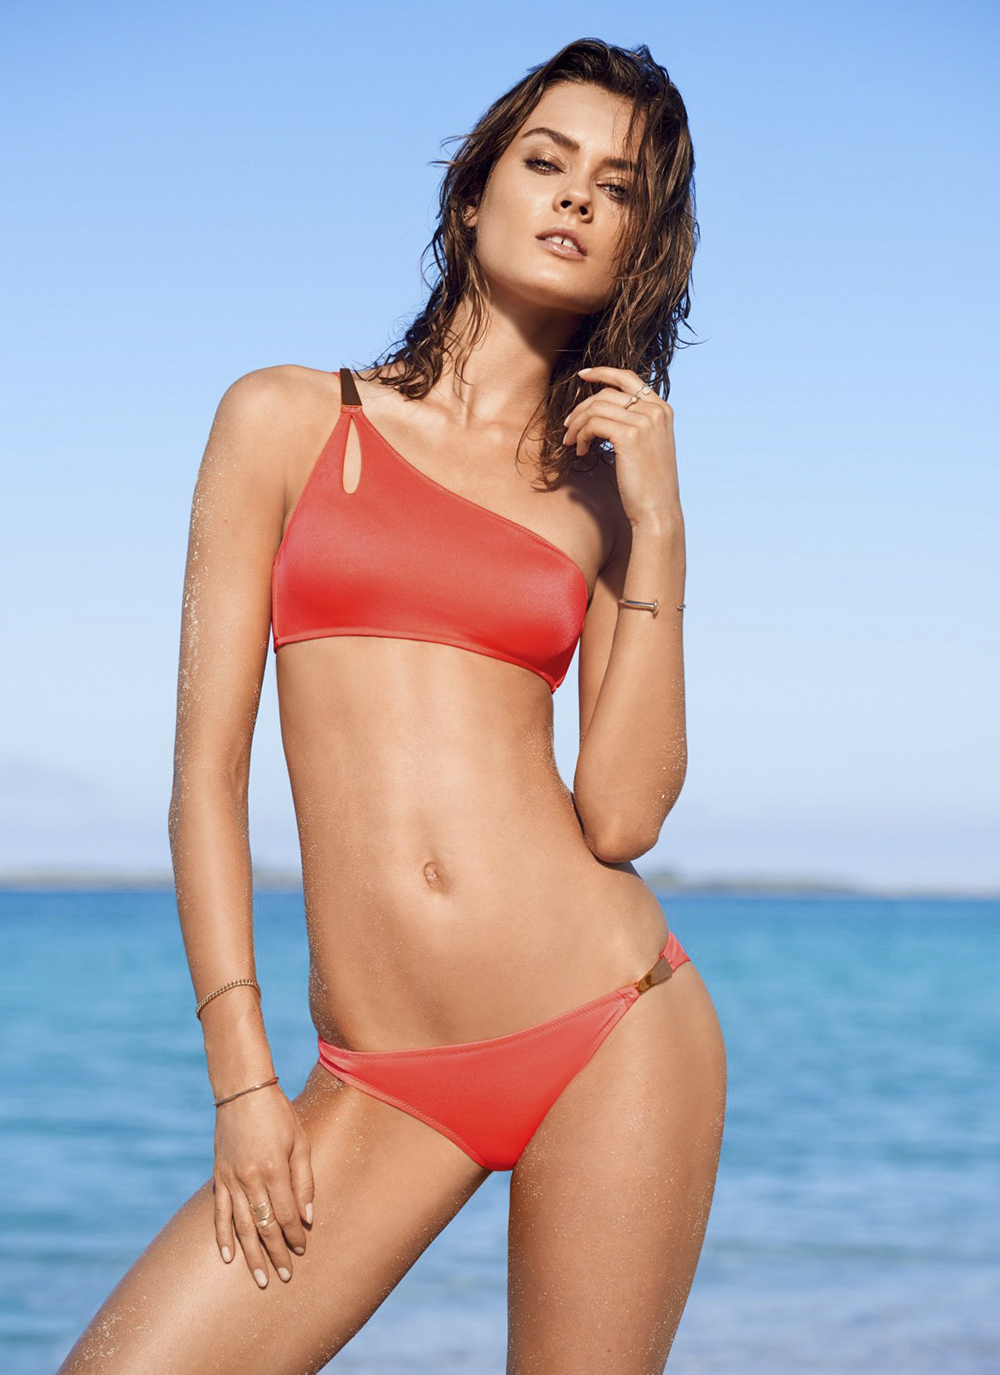 monika-jagaciak-bikini-photoshoot-victoria-s-secret-swim-2014-turks-caicos_4